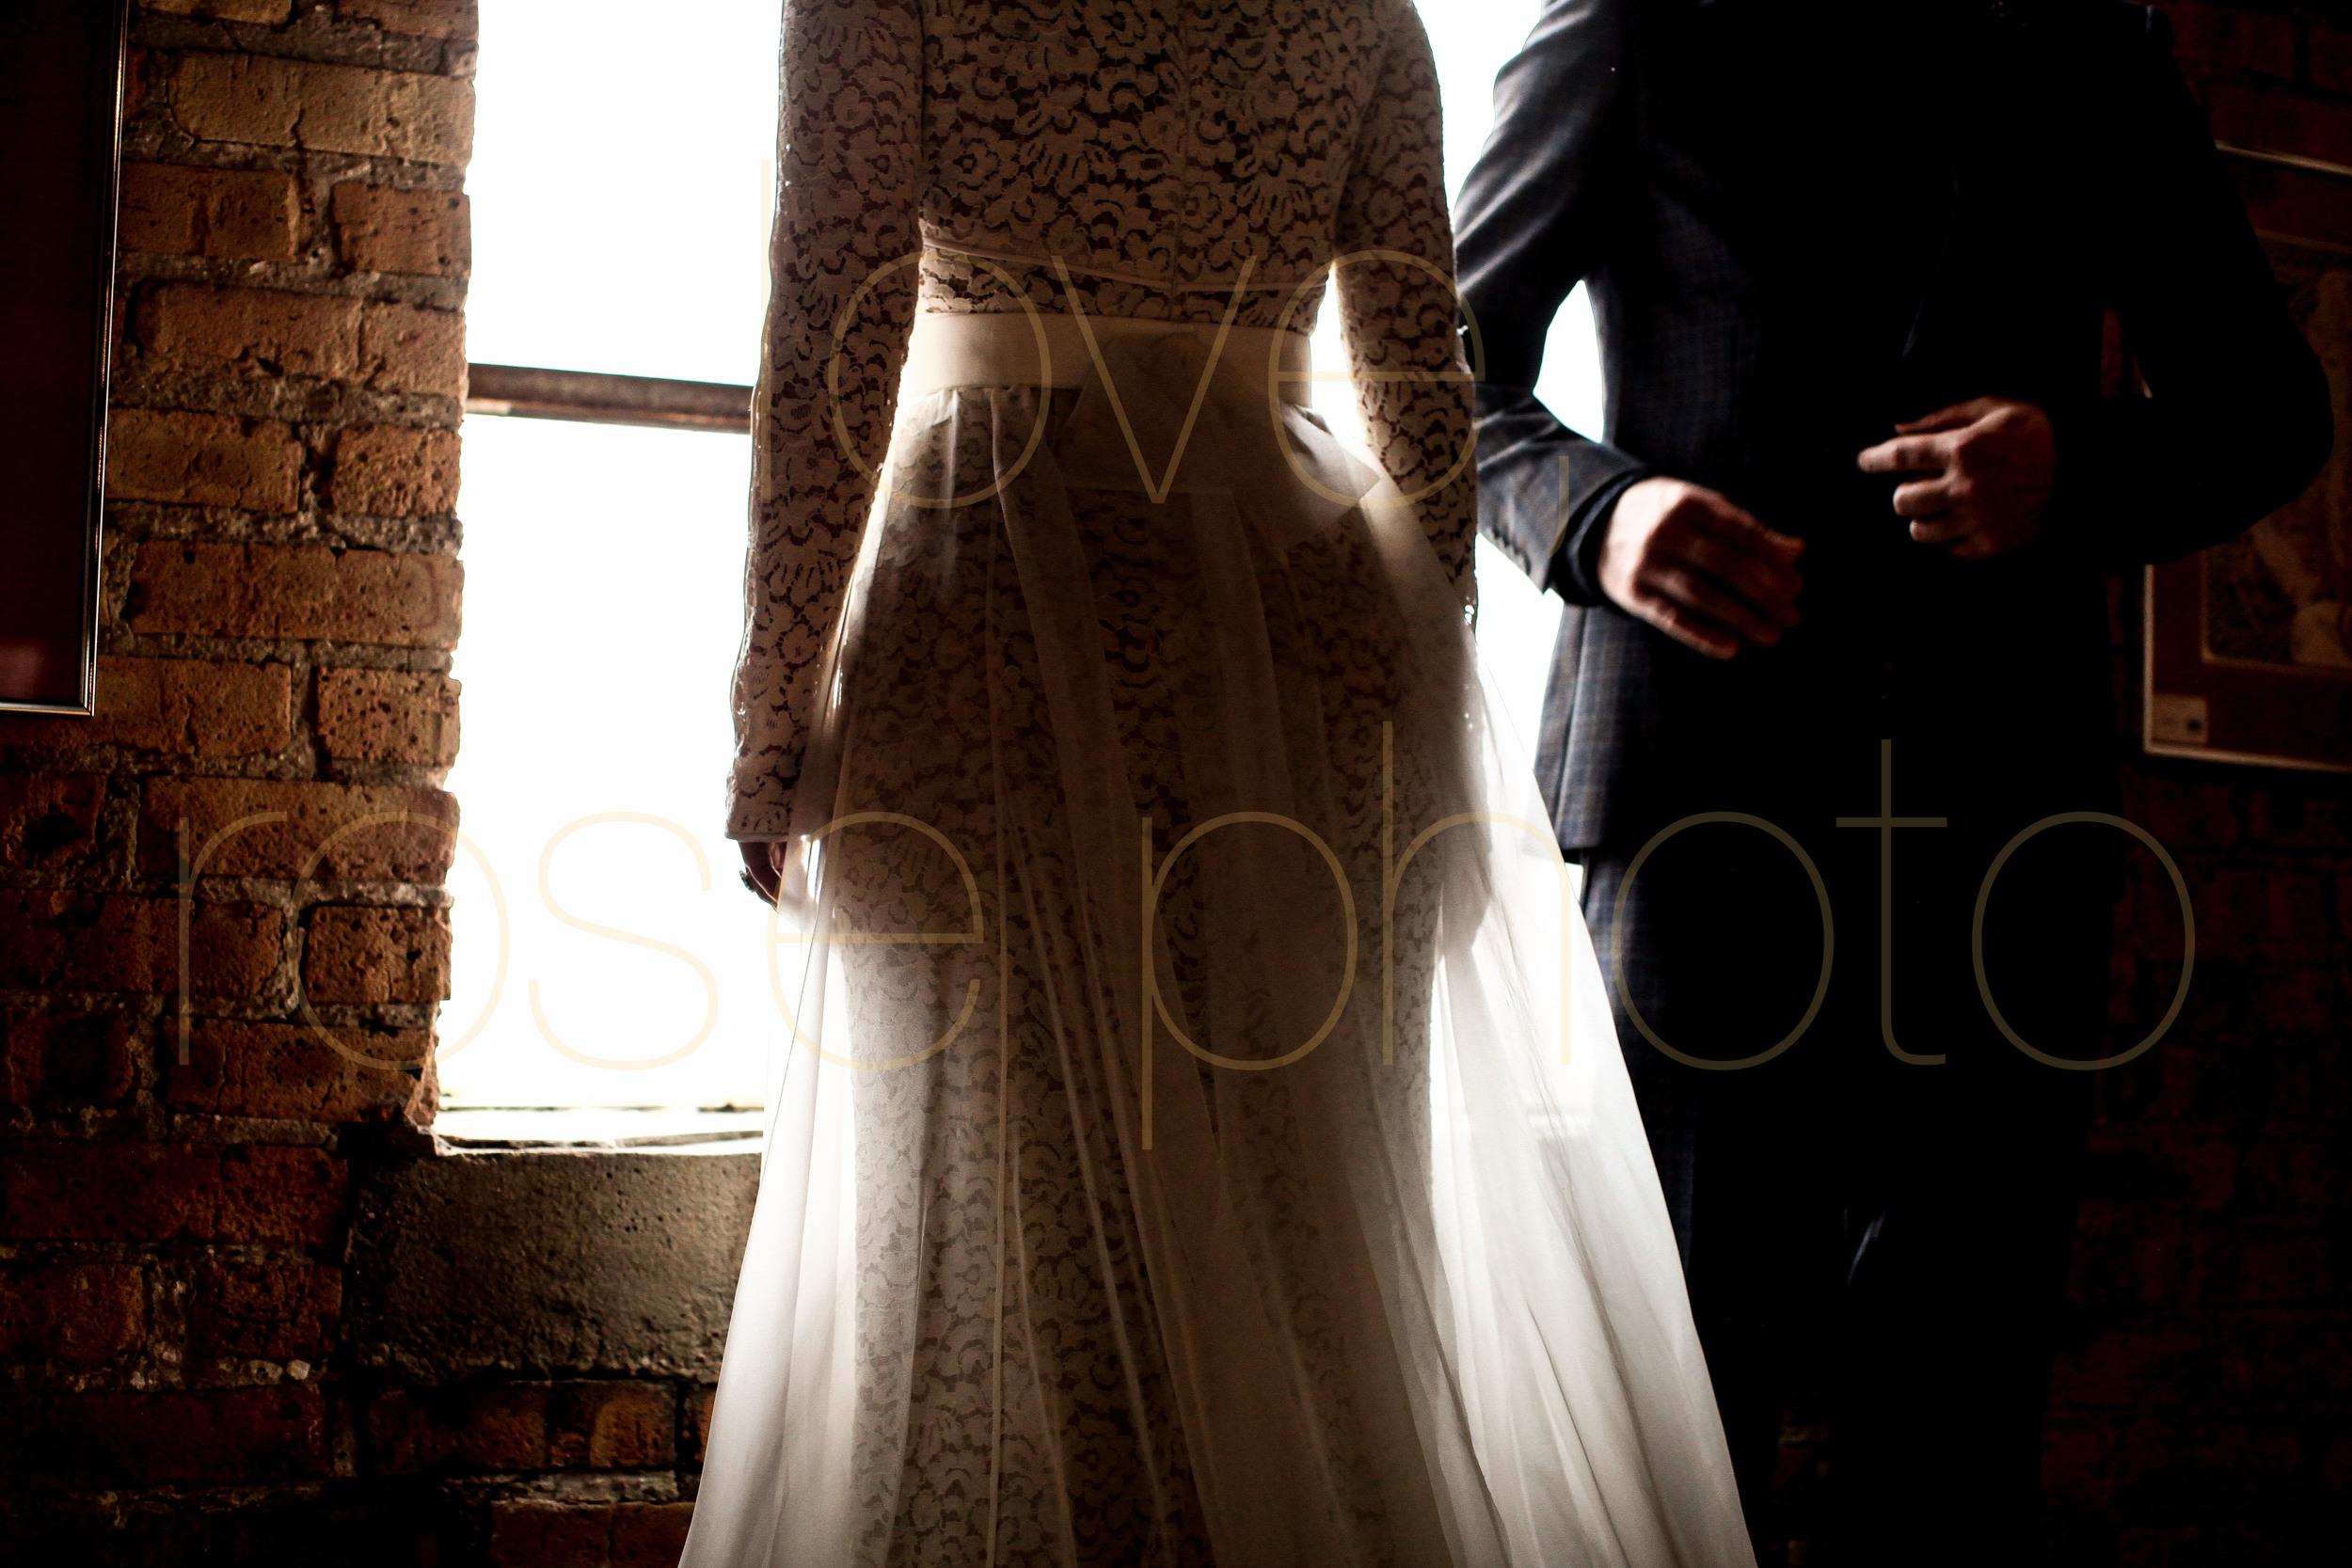 West Fulton Chicago Wedding Venue Salvage One photography enagement photos bride groom first dance-15.jpg